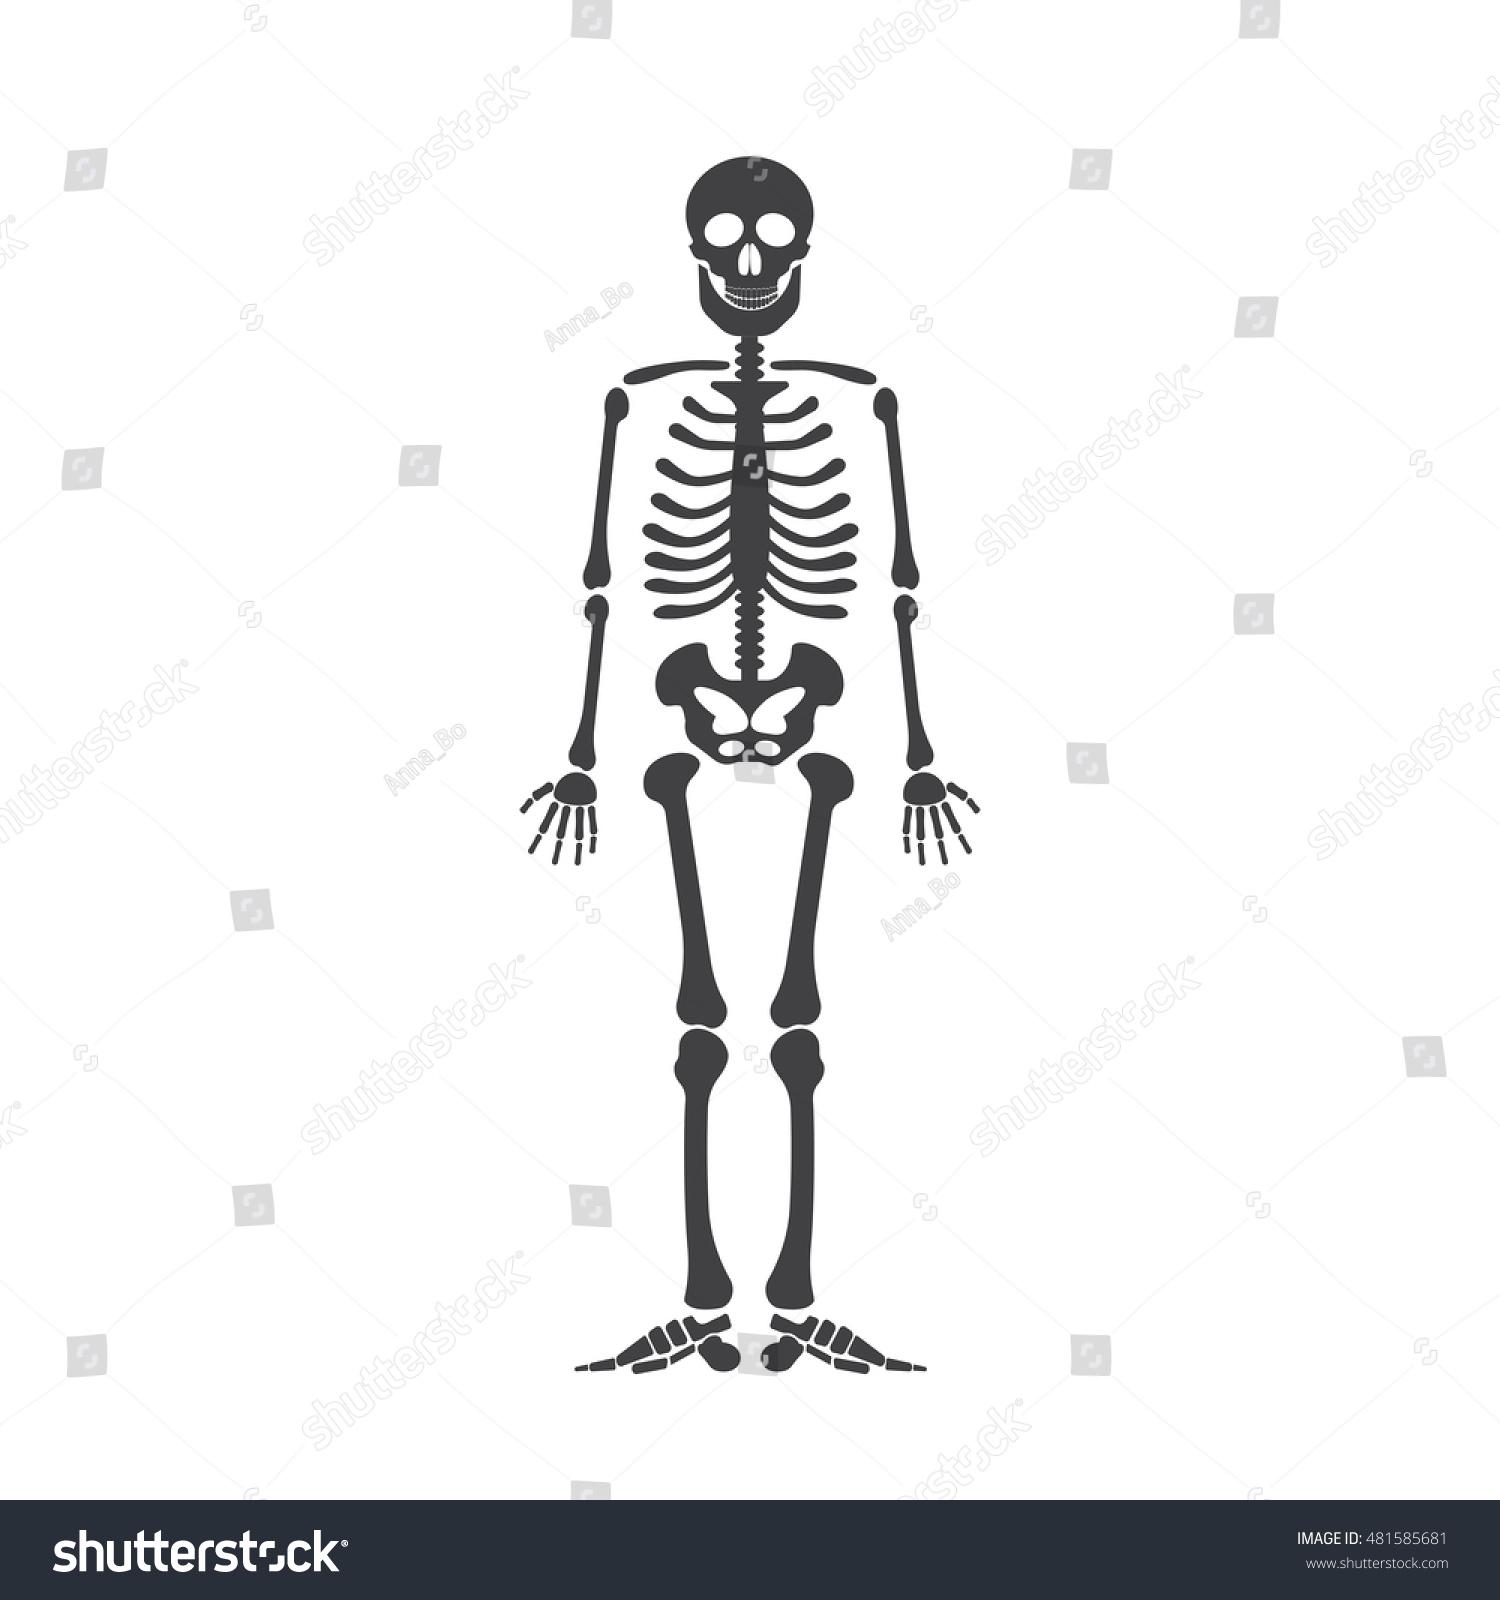 Skeleton Human Anatomy Vector Halloween Black Stock-Vektorgrafik ...